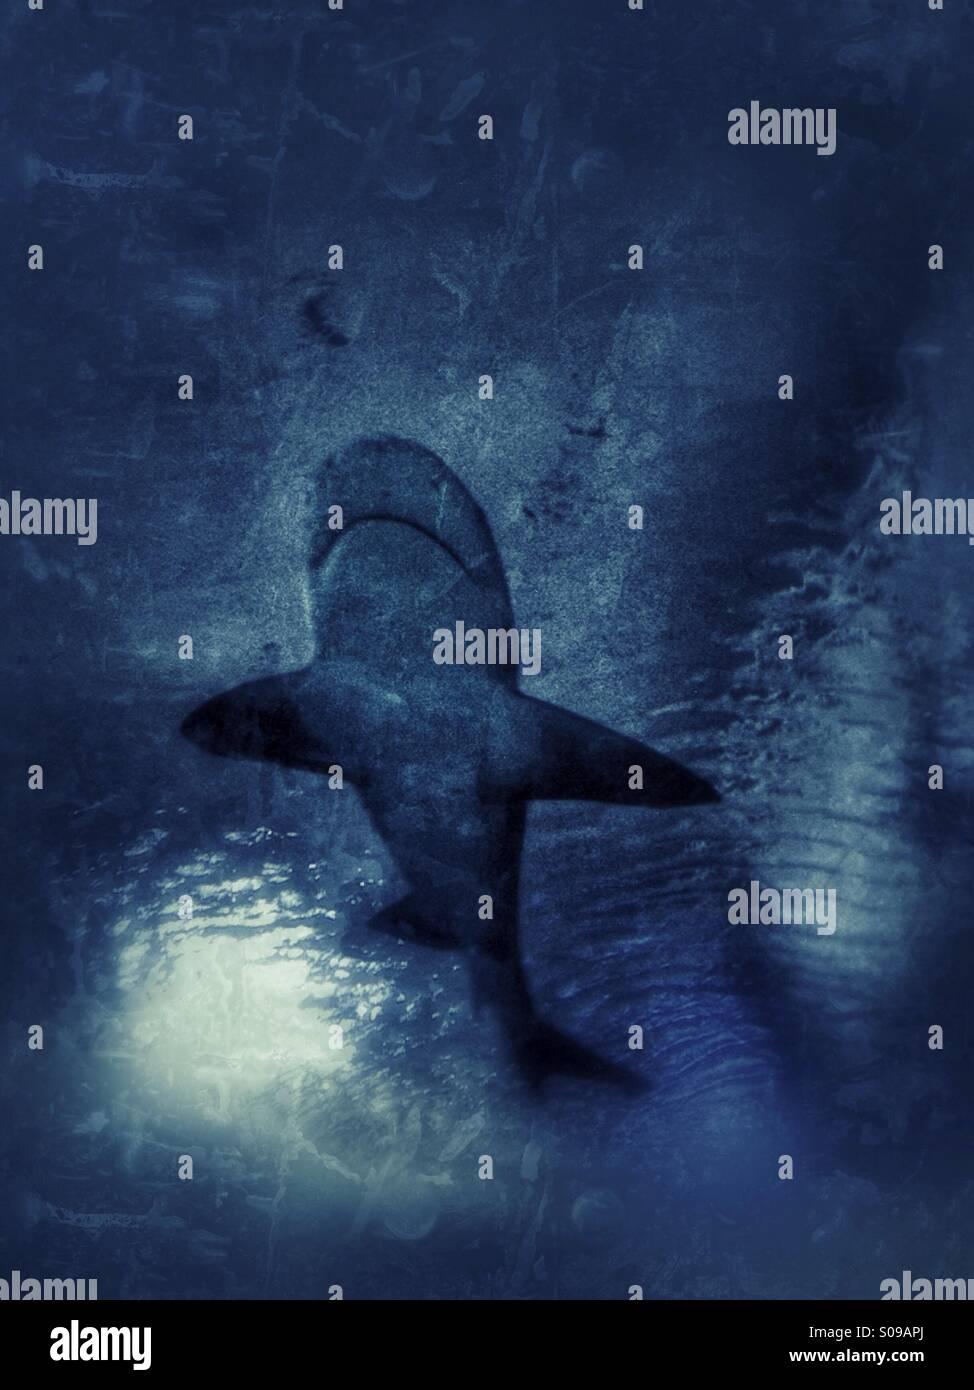 Shark - Stock Image